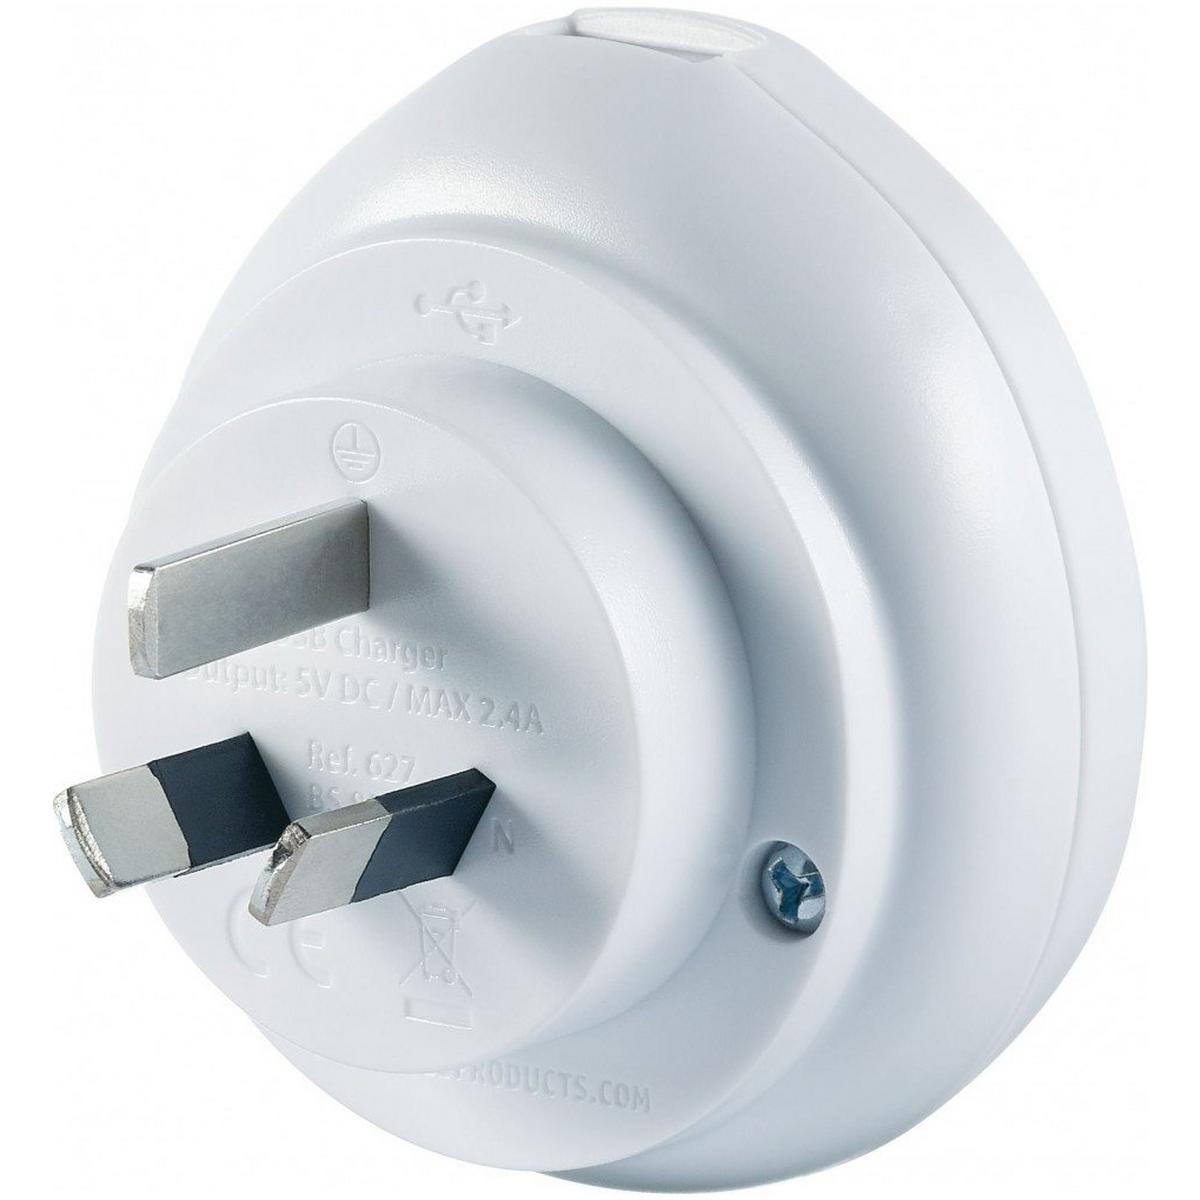 Go Products UK-Aus Adaptor USB 627